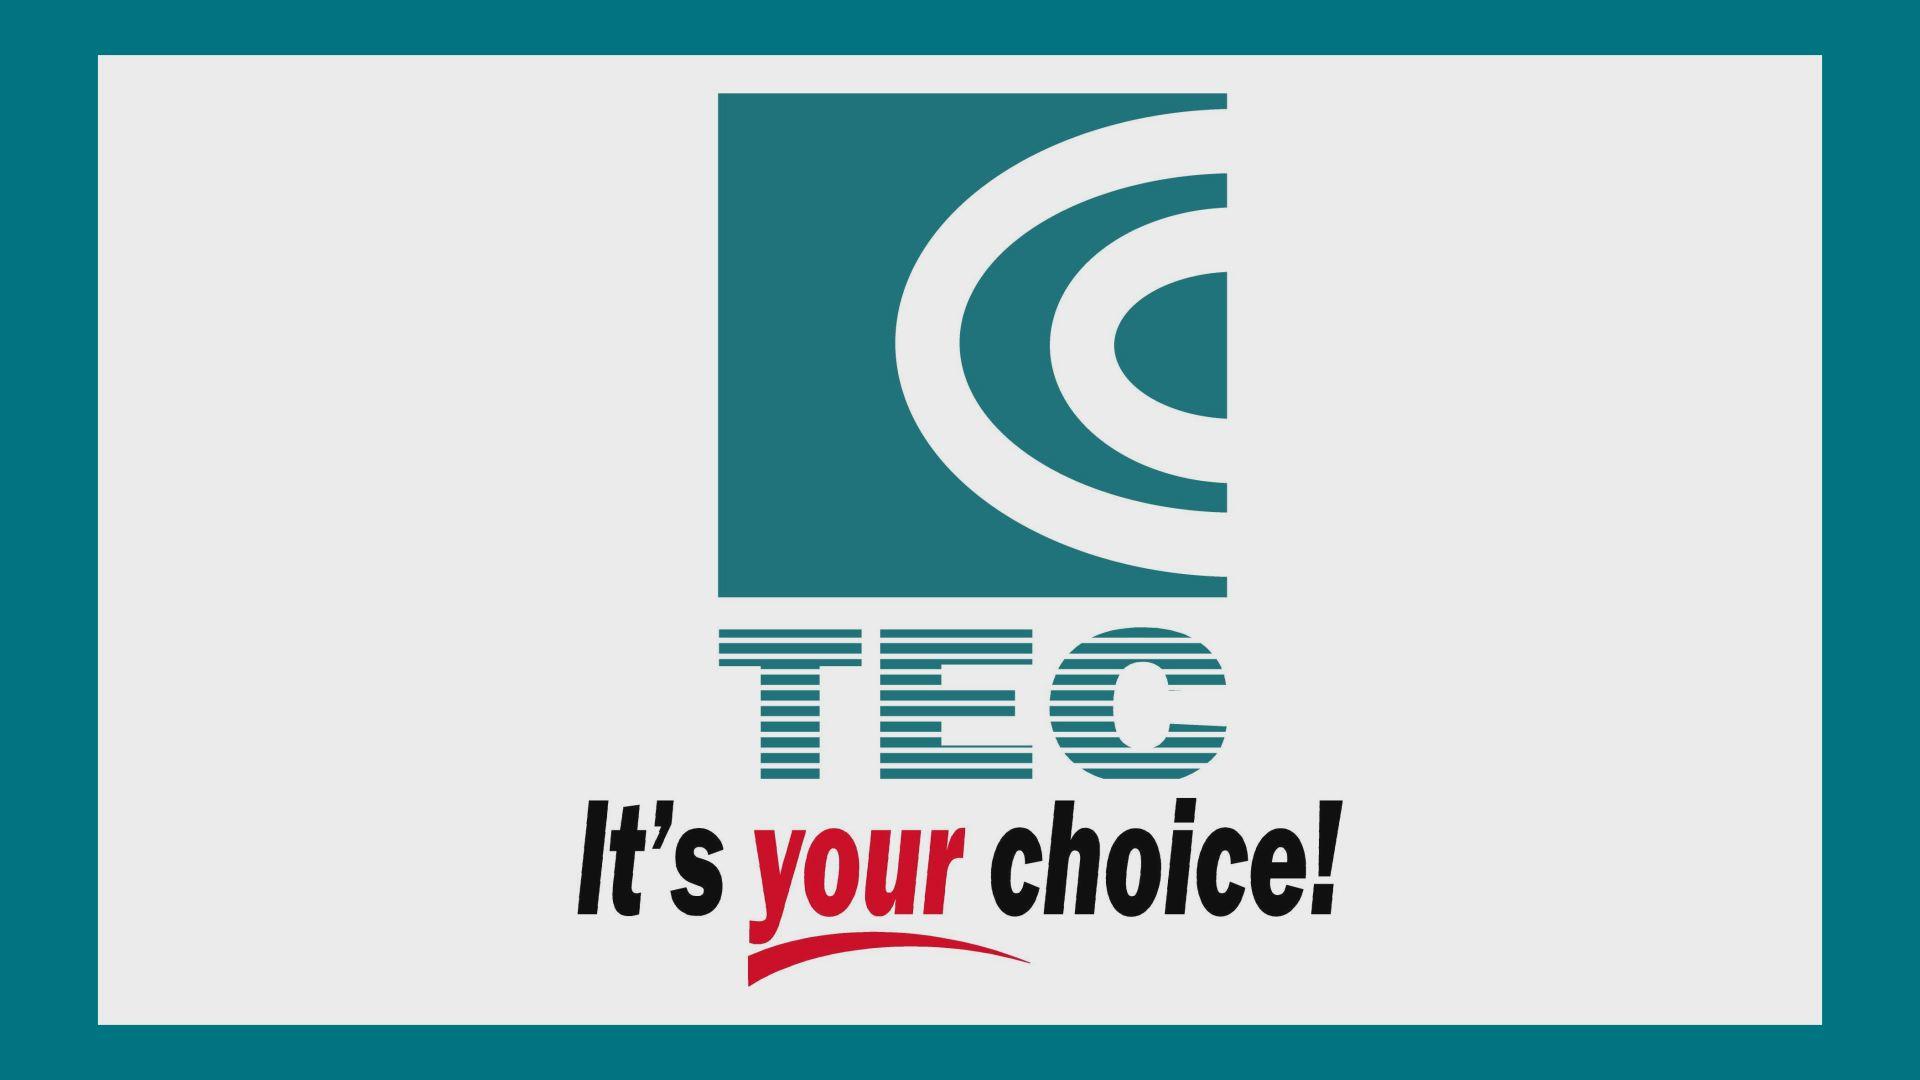 CC Tec Video Production